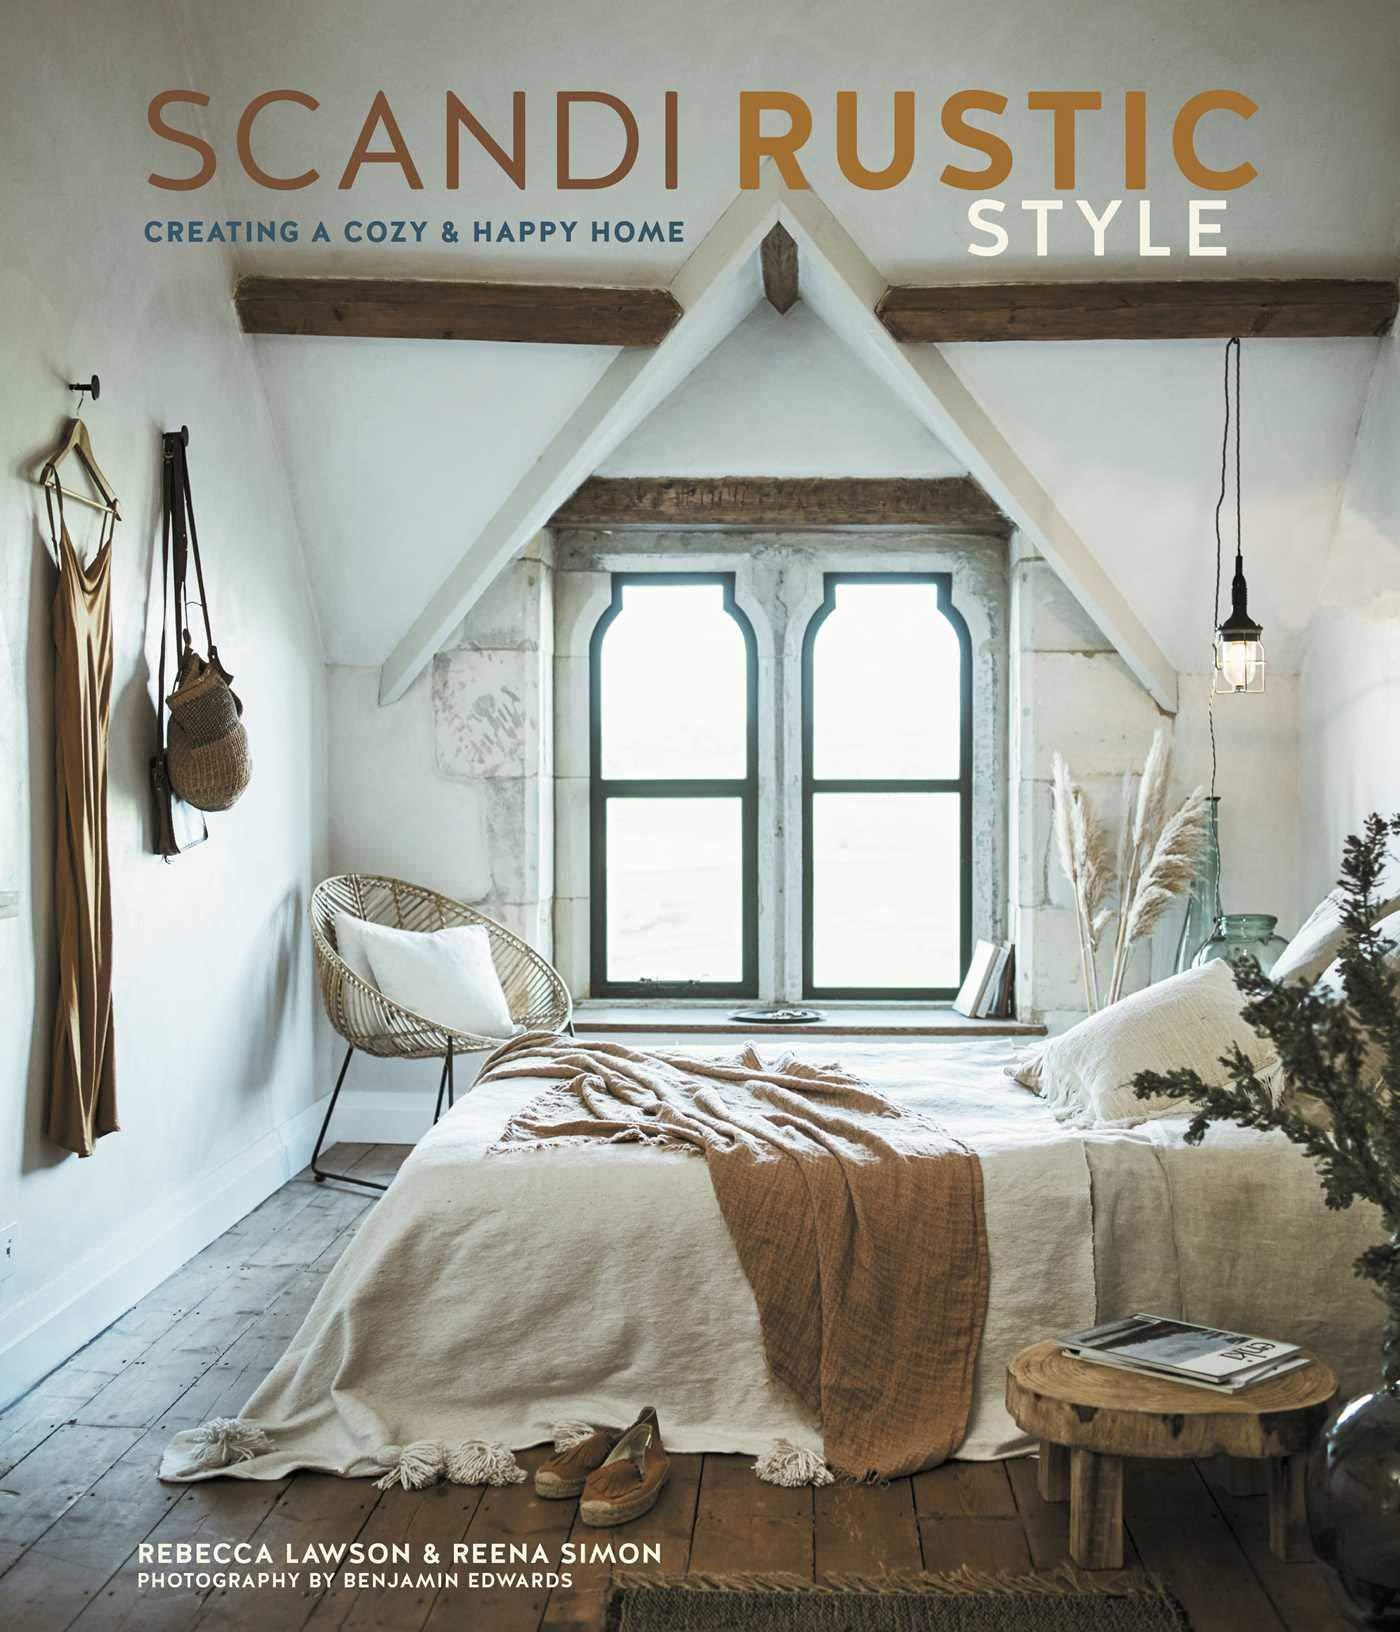 Scandi Rustic Style - Creating a Cozy and Happy Home by Rebecca Lawson & Reena Simon - book cover. #scandirustic #scandinavianstyle #rusticdecor #modernrustic #interiordesign #designbooks #decorbooks